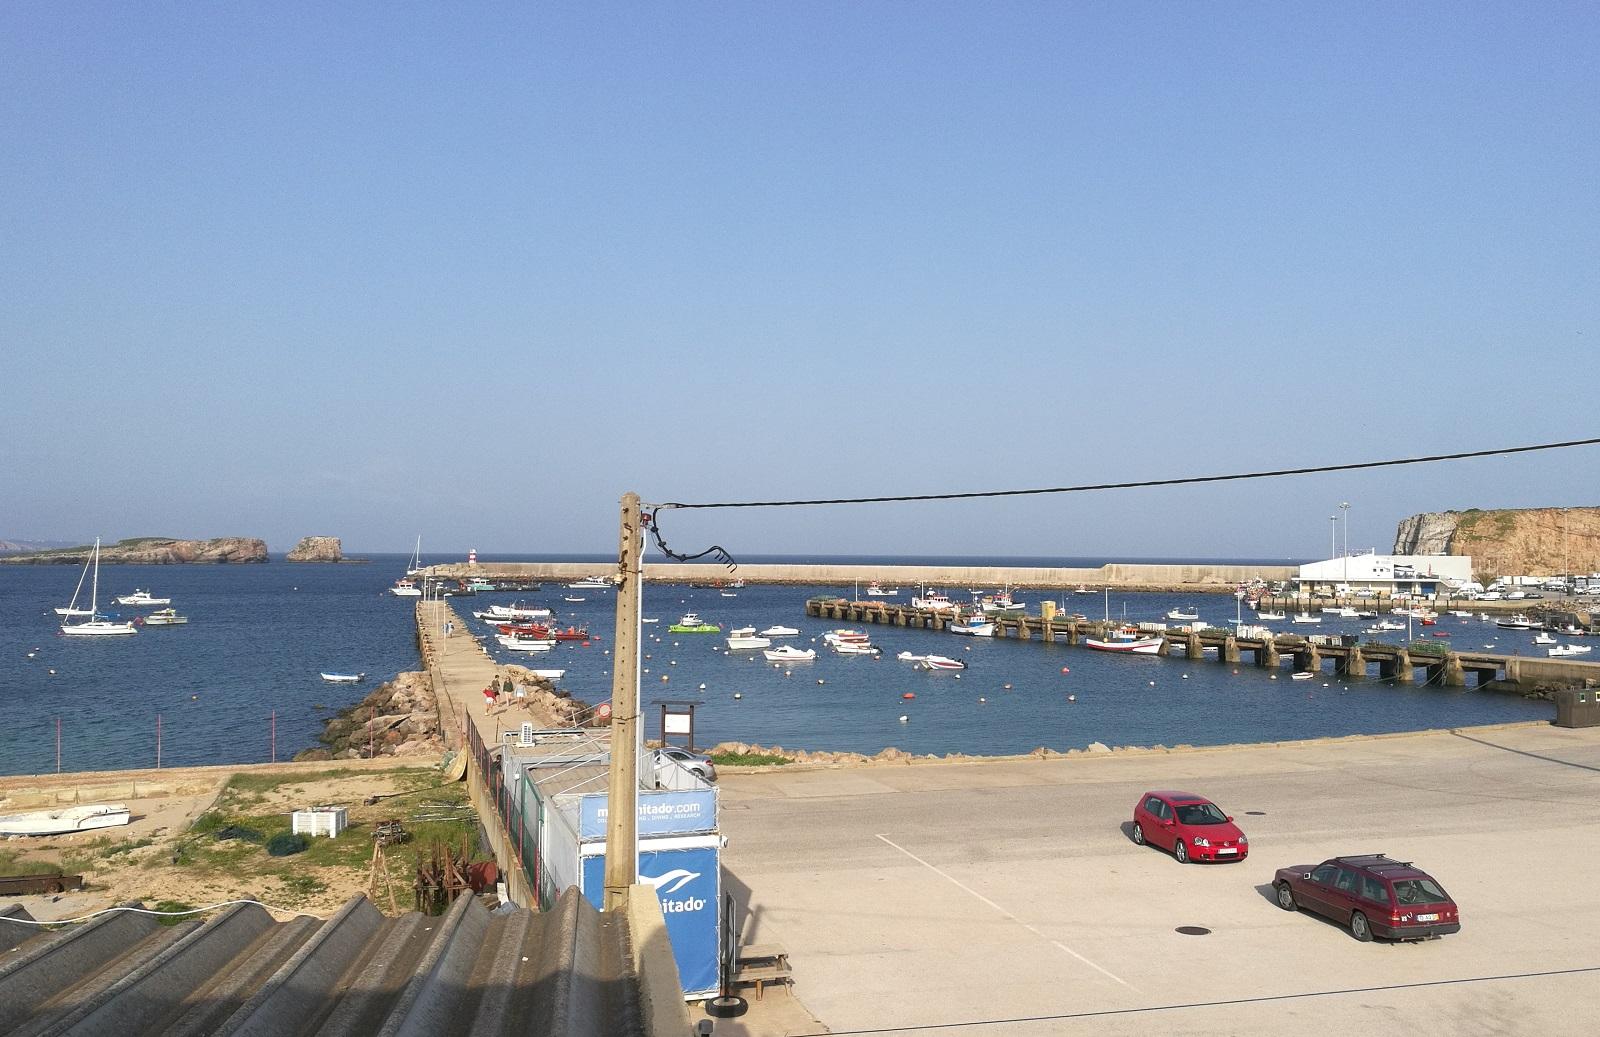 Baleeira, přístav